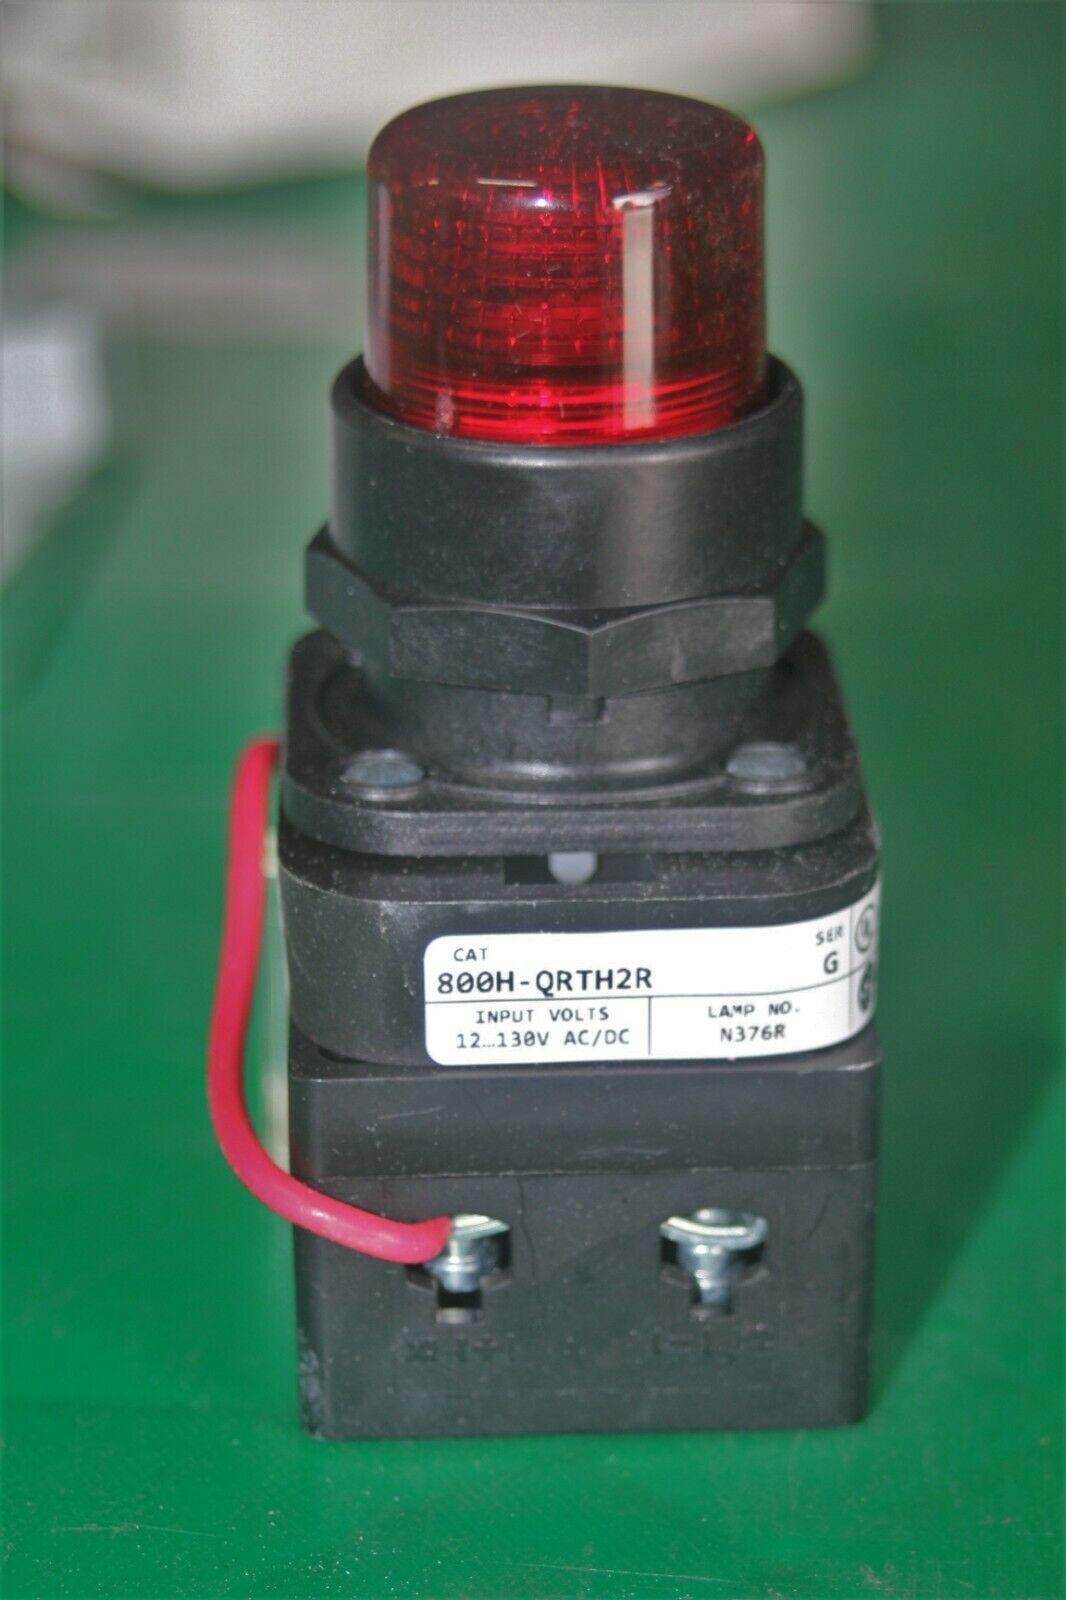 Allen Bradley 30MM Bulletin Pilot Light 800H-QRTH2R image 4